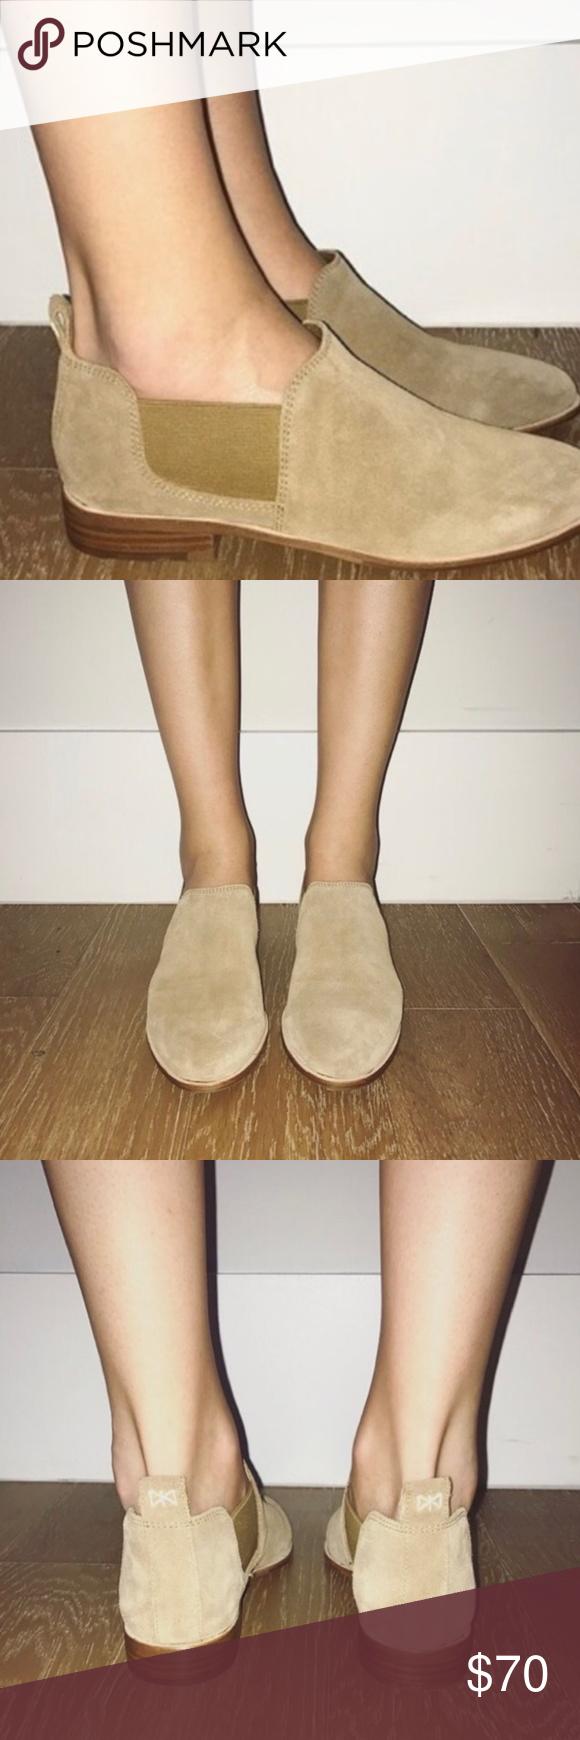 G.H. Bass & Co. Women's Brooke Ankle Bootie